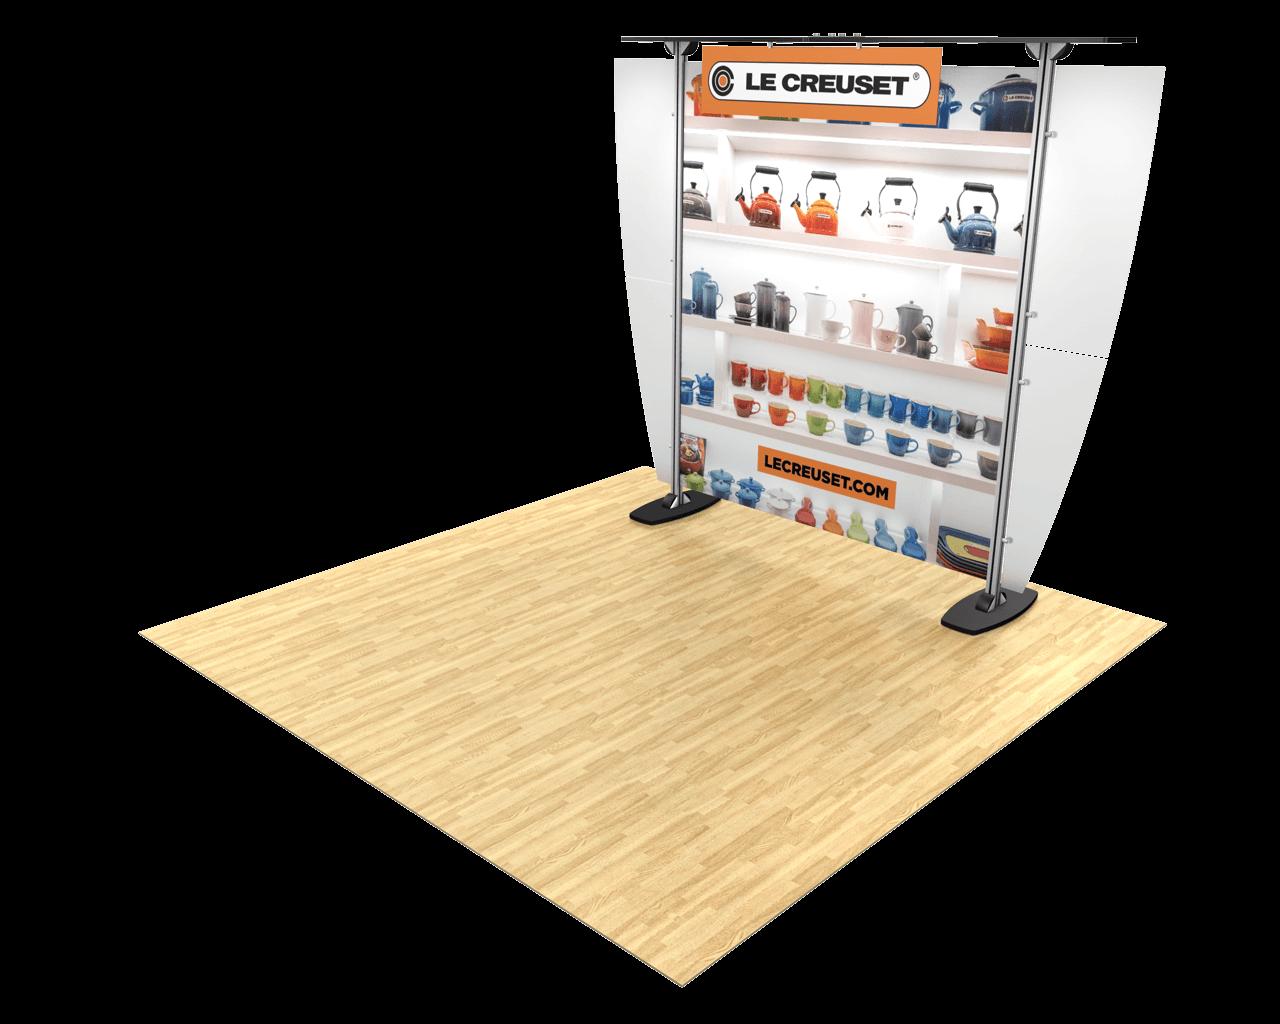 Exhibitline 10ft Trade Show Display - ex1.0 Model